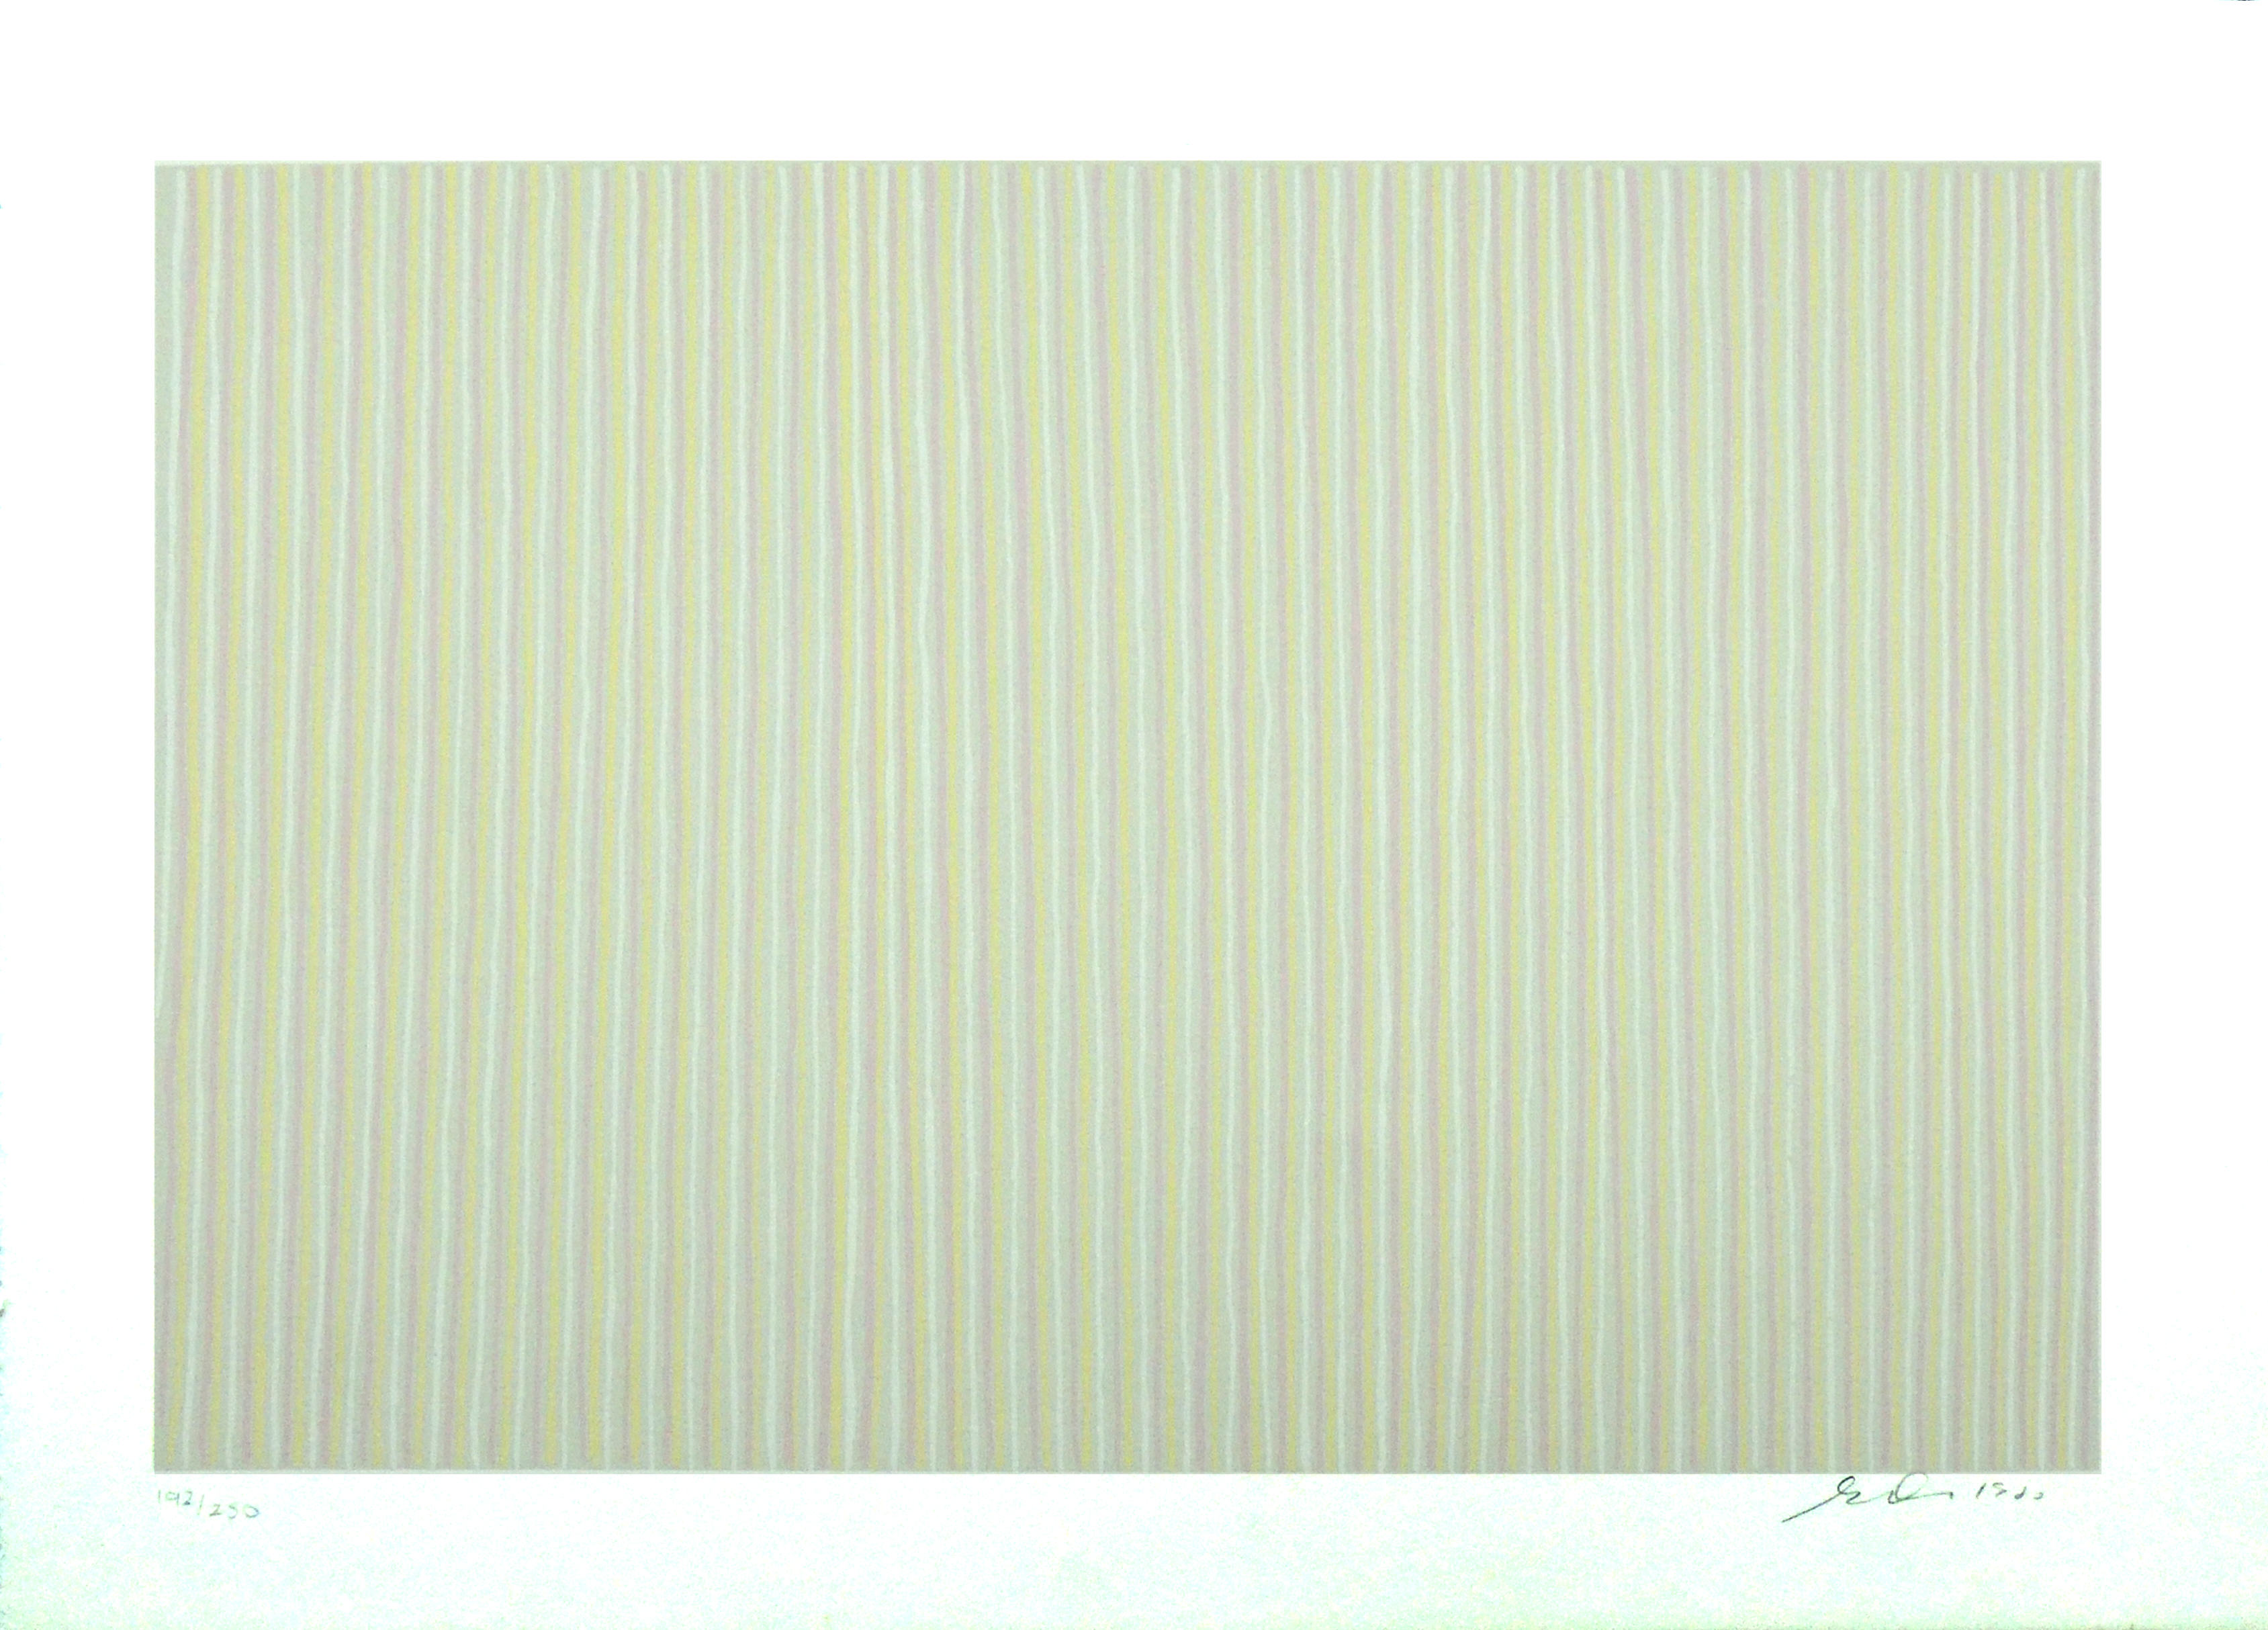 "1996.034 | Gene Davis | CAROUSEL | lithograph |17 X 23-1/2"" | 1980 | Gift of Adam E. Schuster"